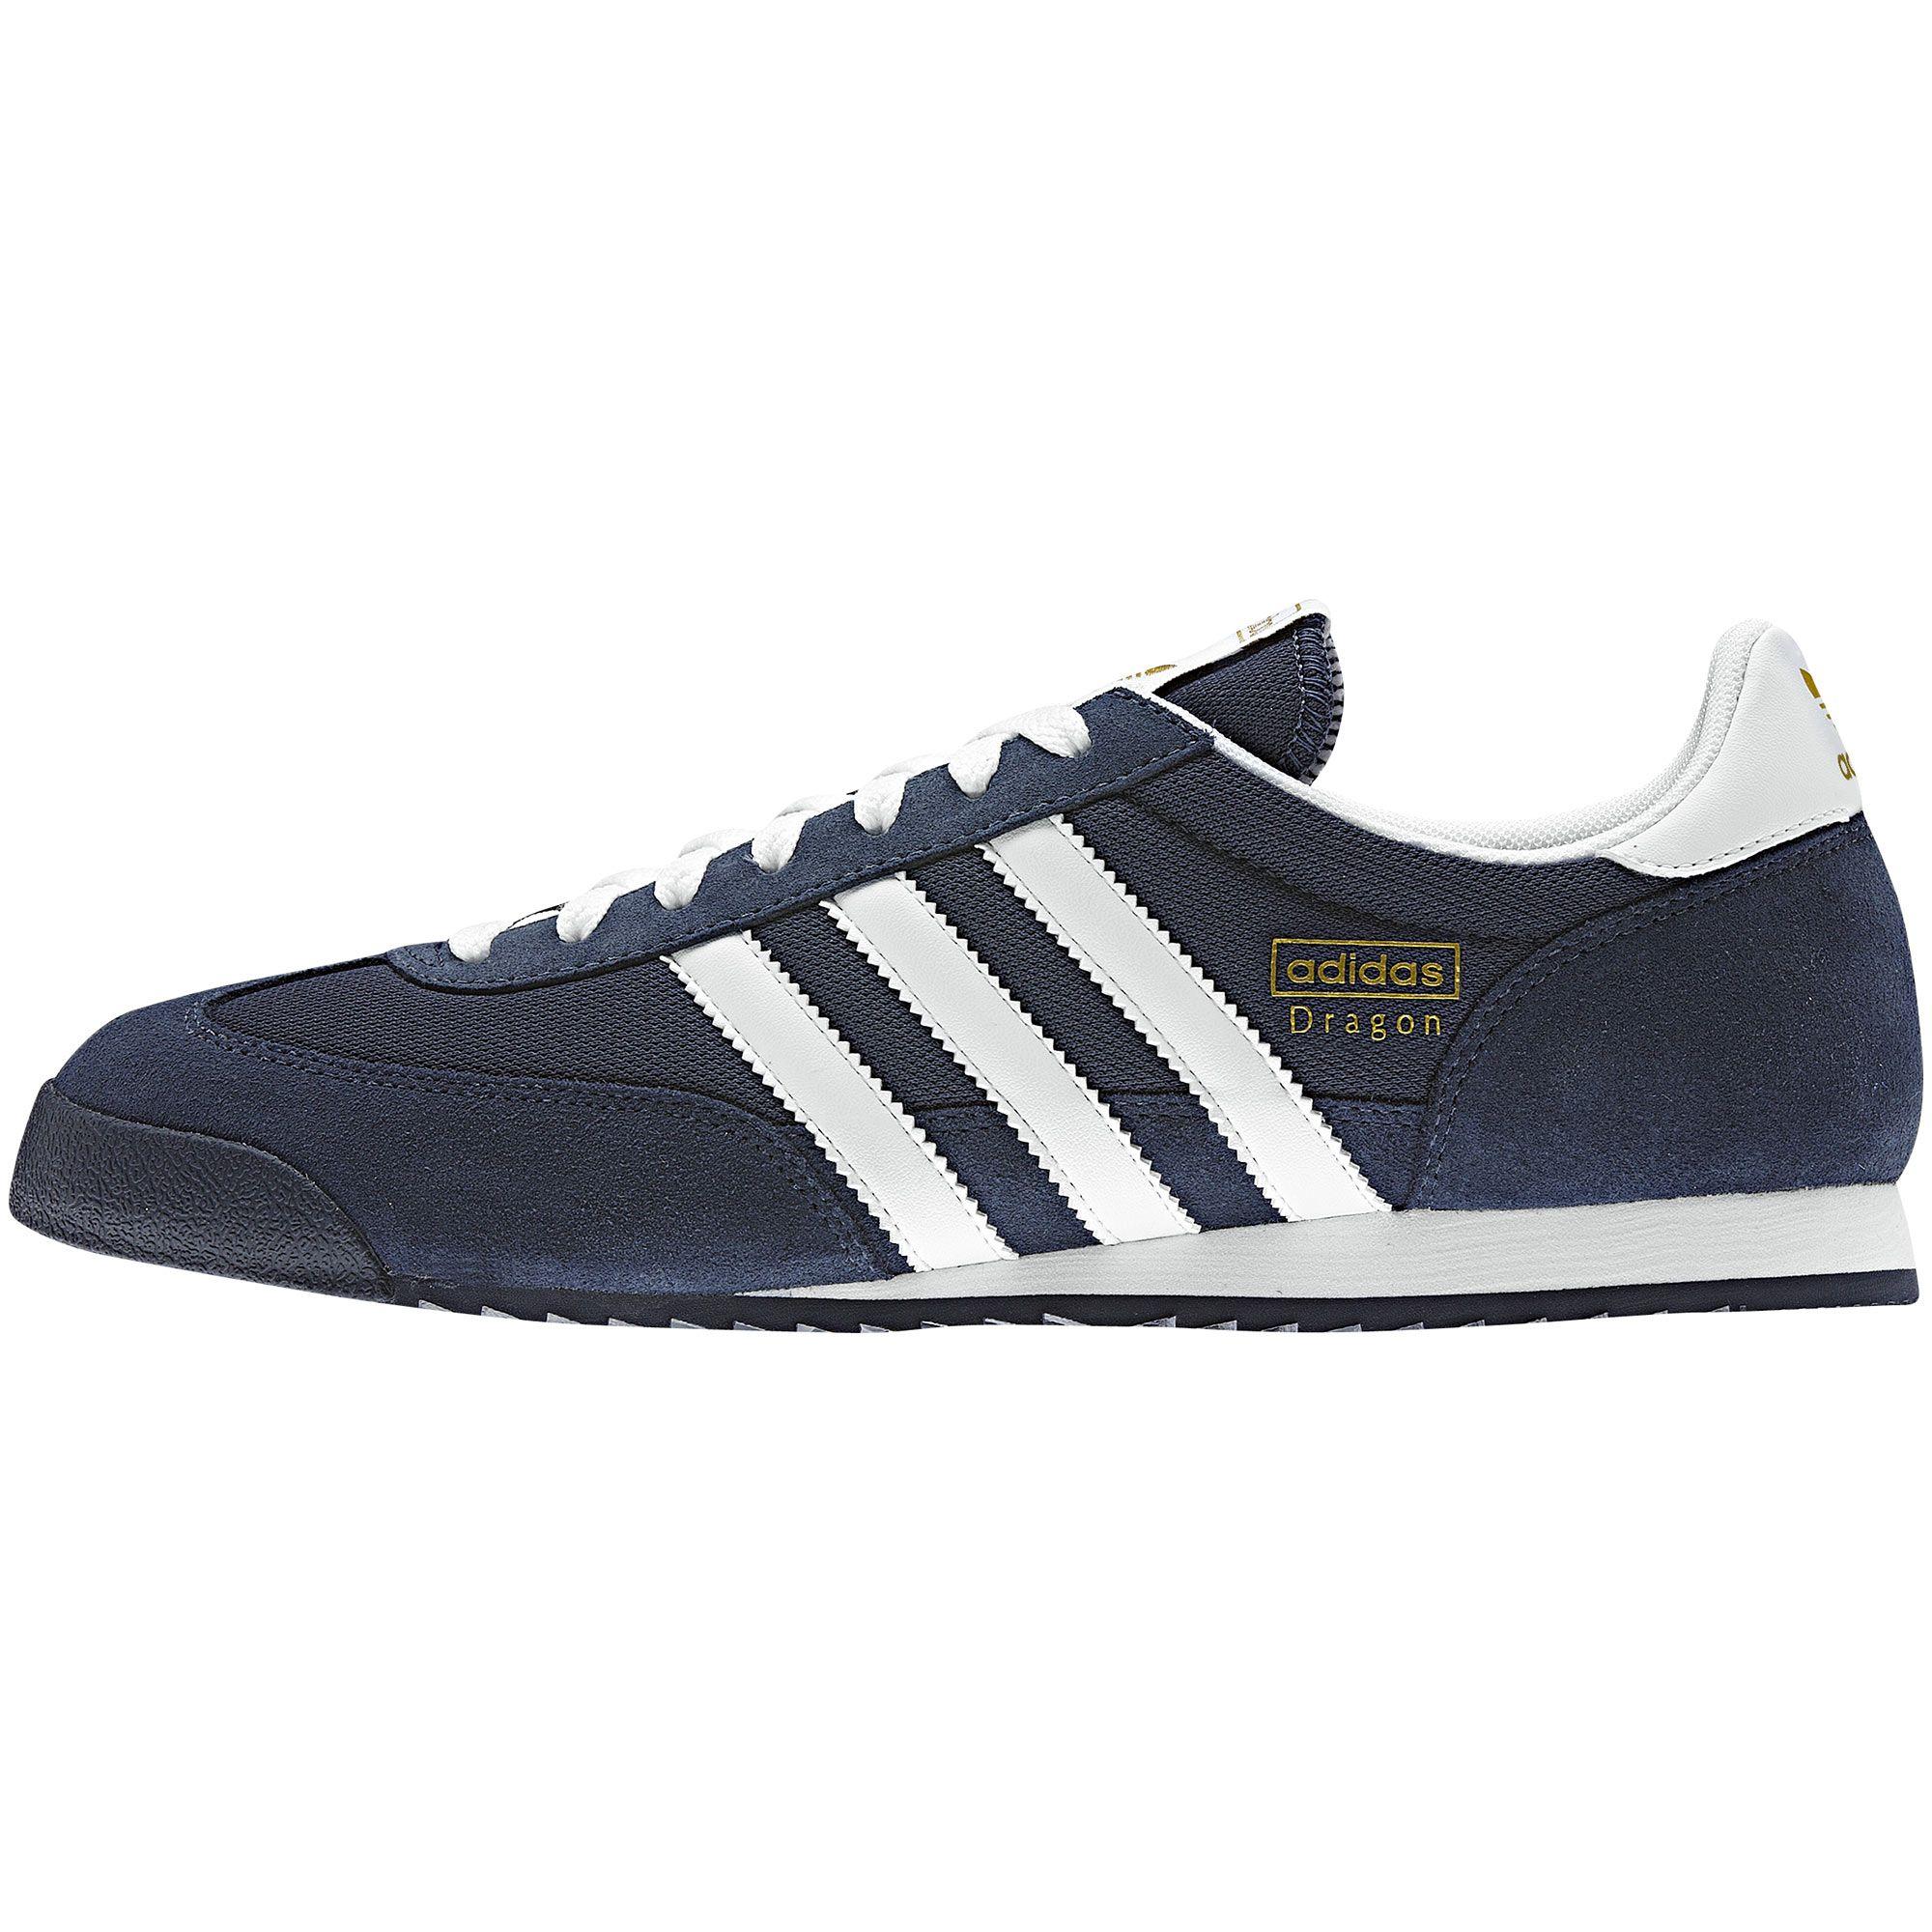 5536aefa77d tenis adidas dragon azul